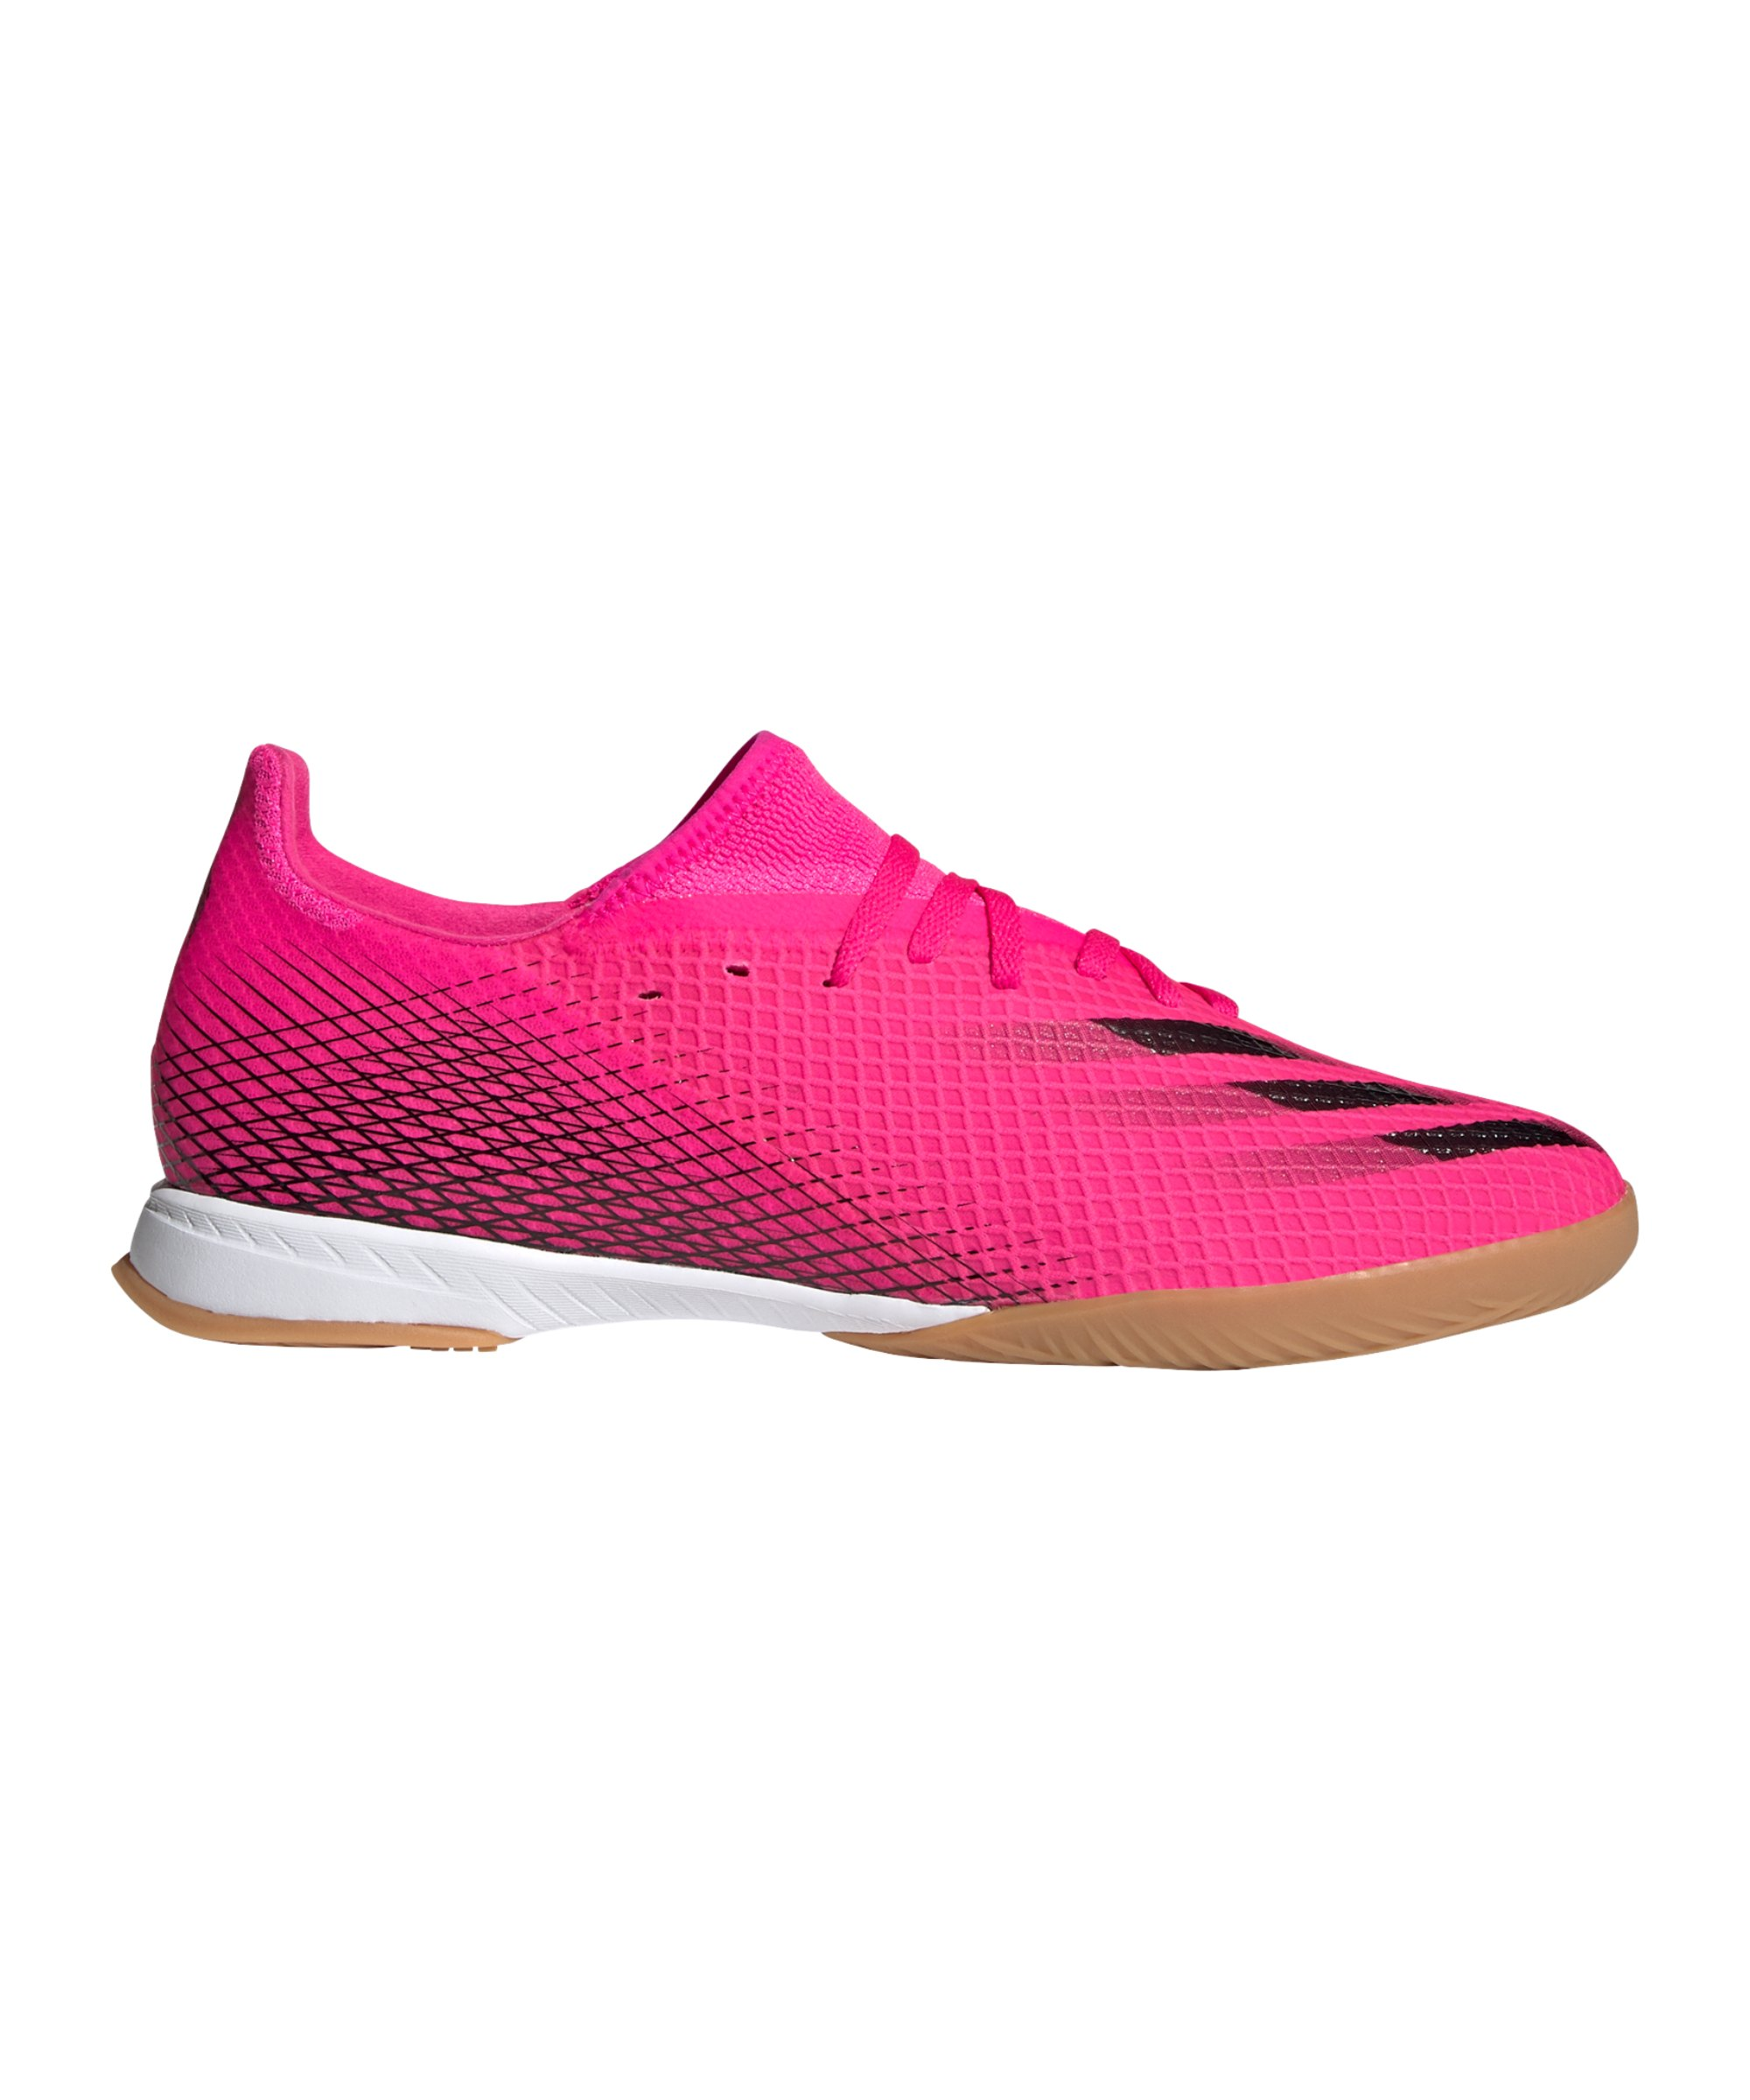 adidas X GHOSTED.3 IN Halle Superspectral Pink Schwarz Orange - pink